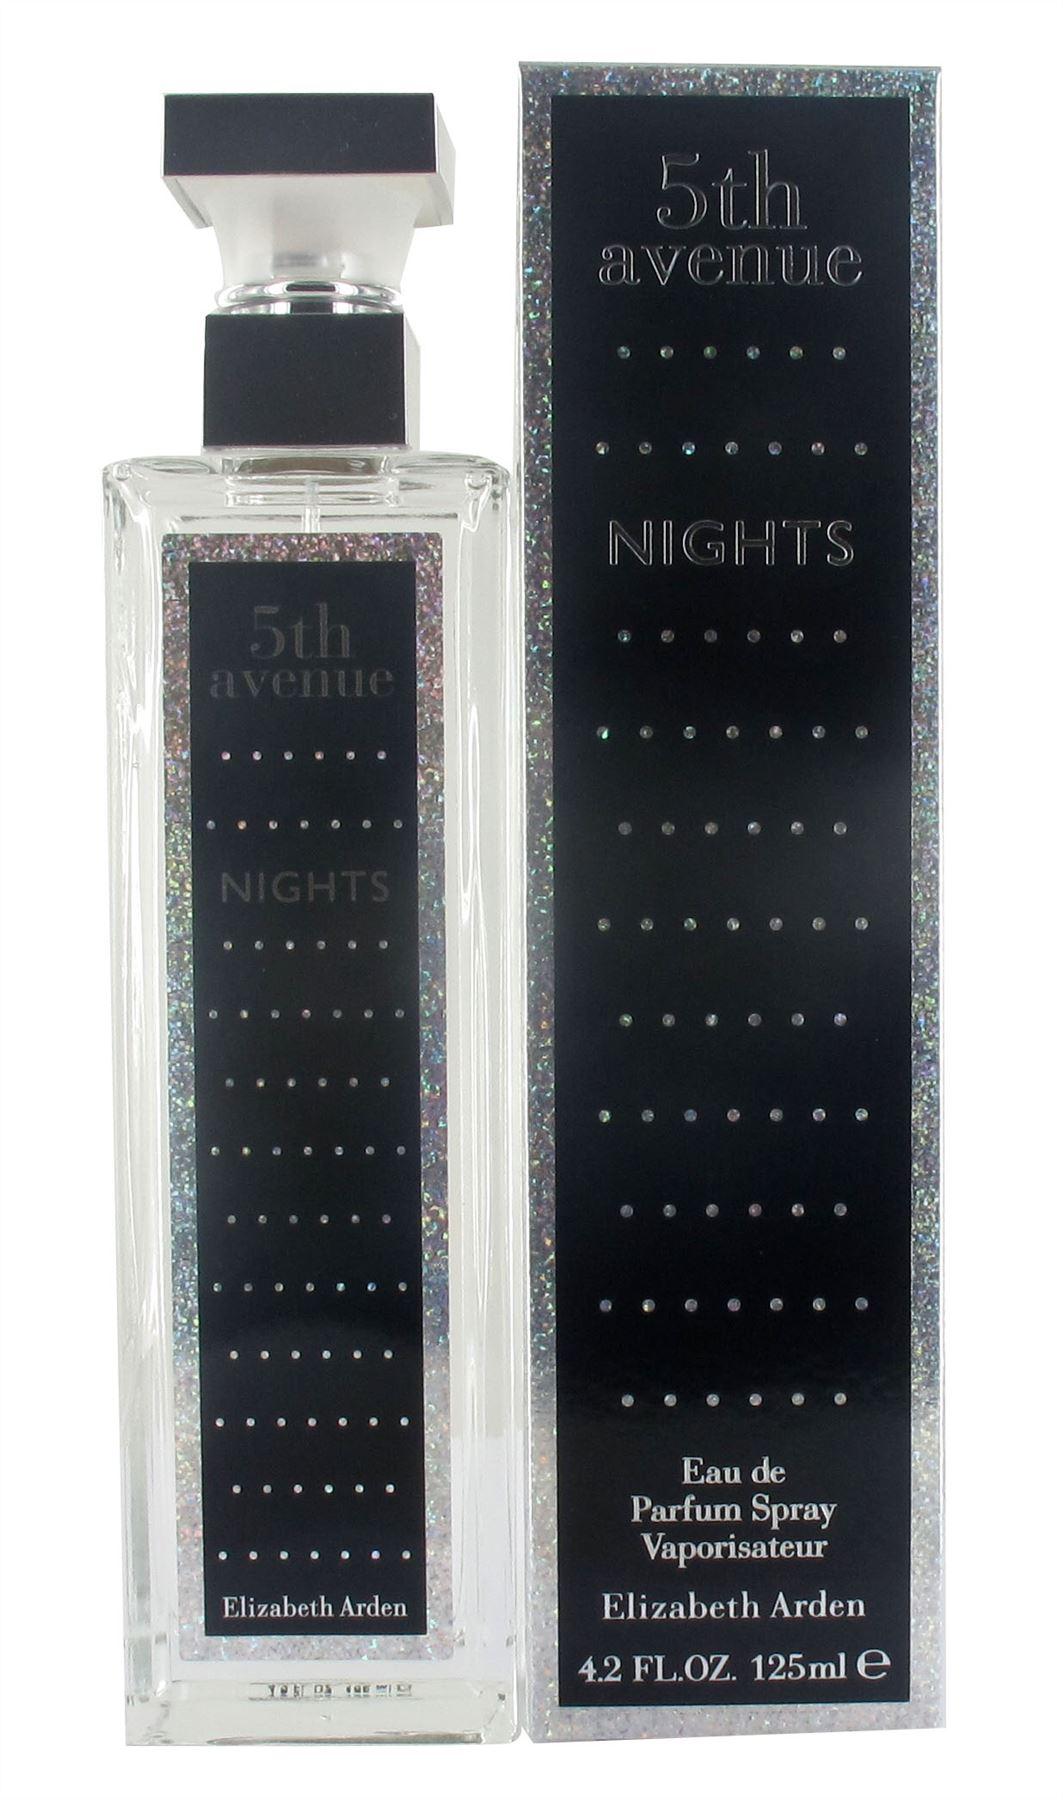 ca9640367 Elizabeth Arden 5th Avenue Night 125ml Eau de Parfum Spray for Women - New